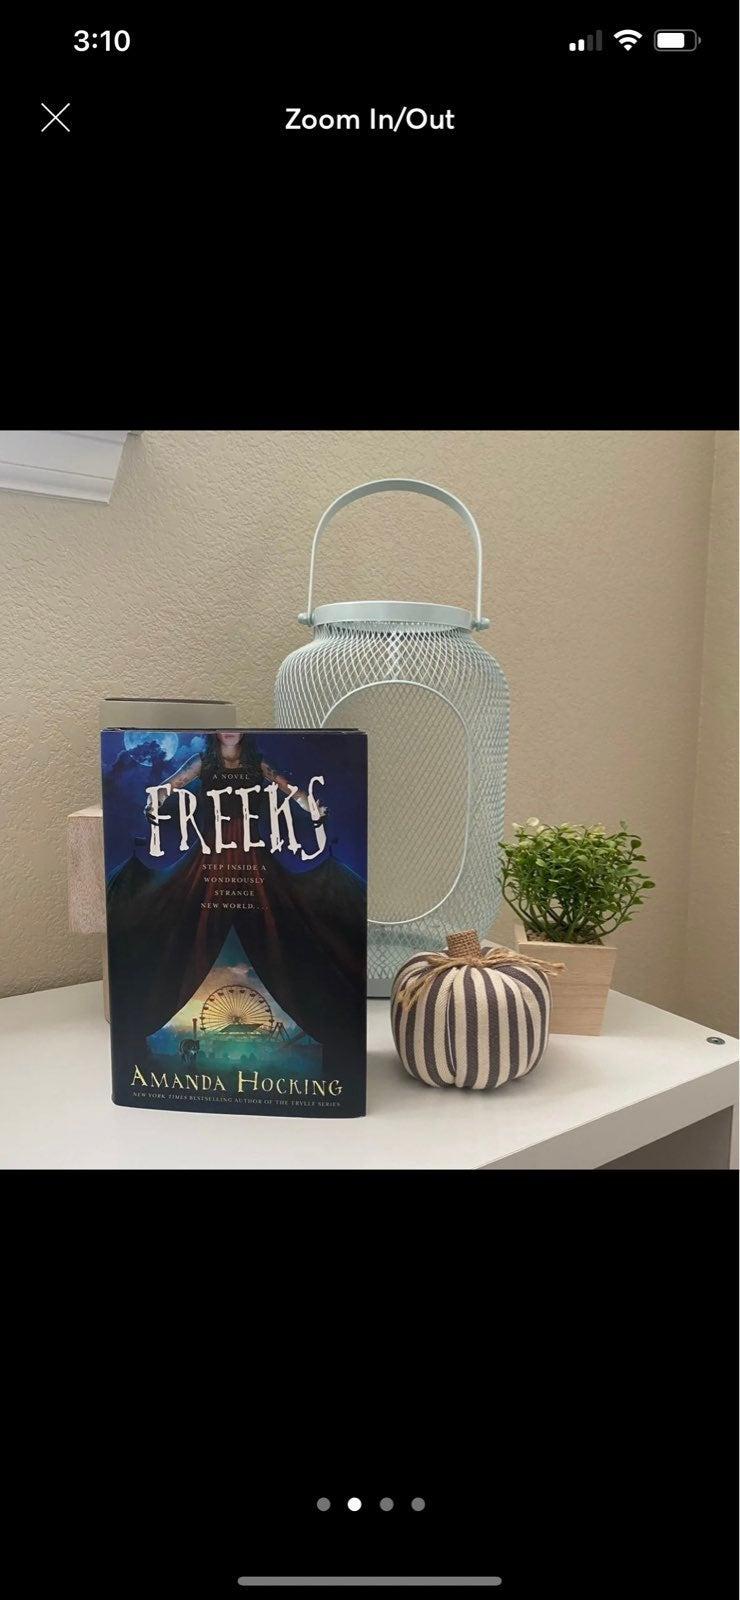 Freeks, Amanda Hocking, Book